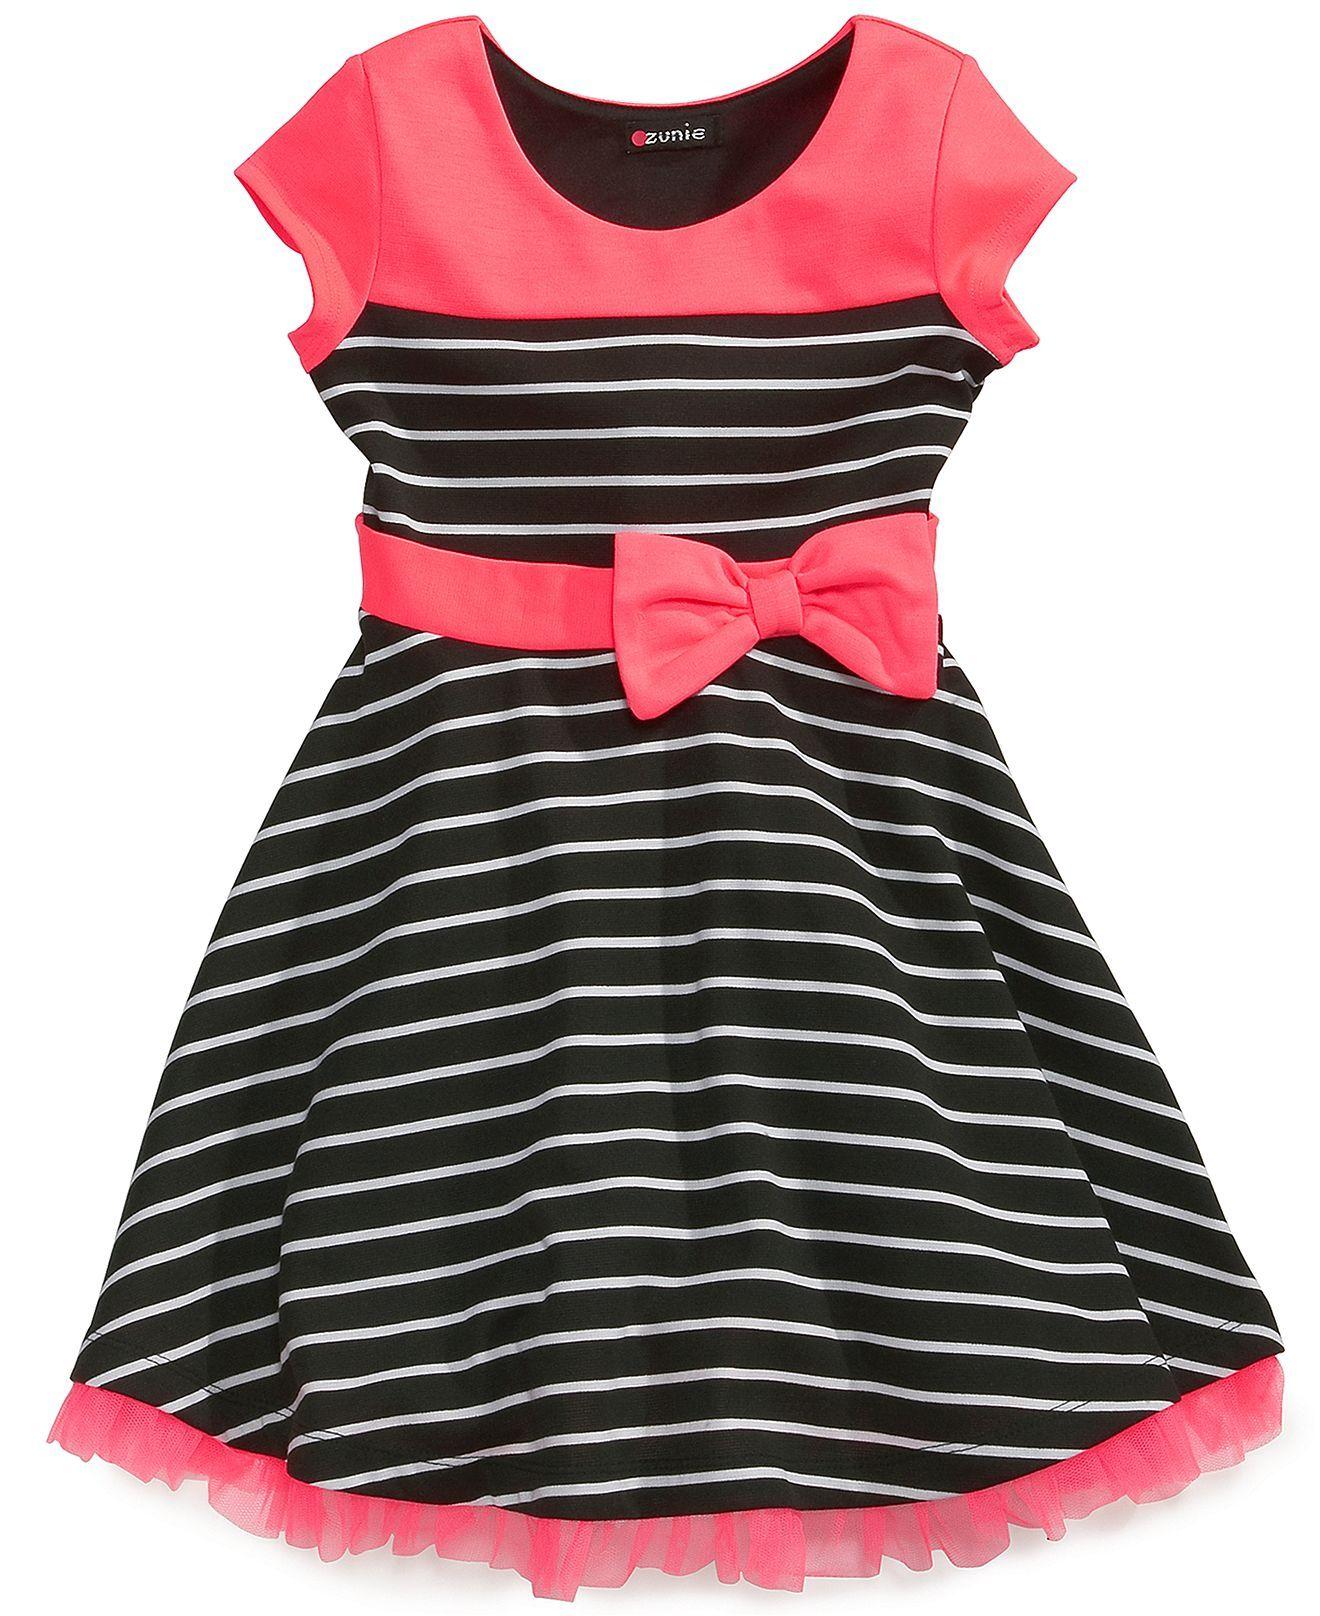 Pink u violet little girlsu striped shortsleeve dress kids